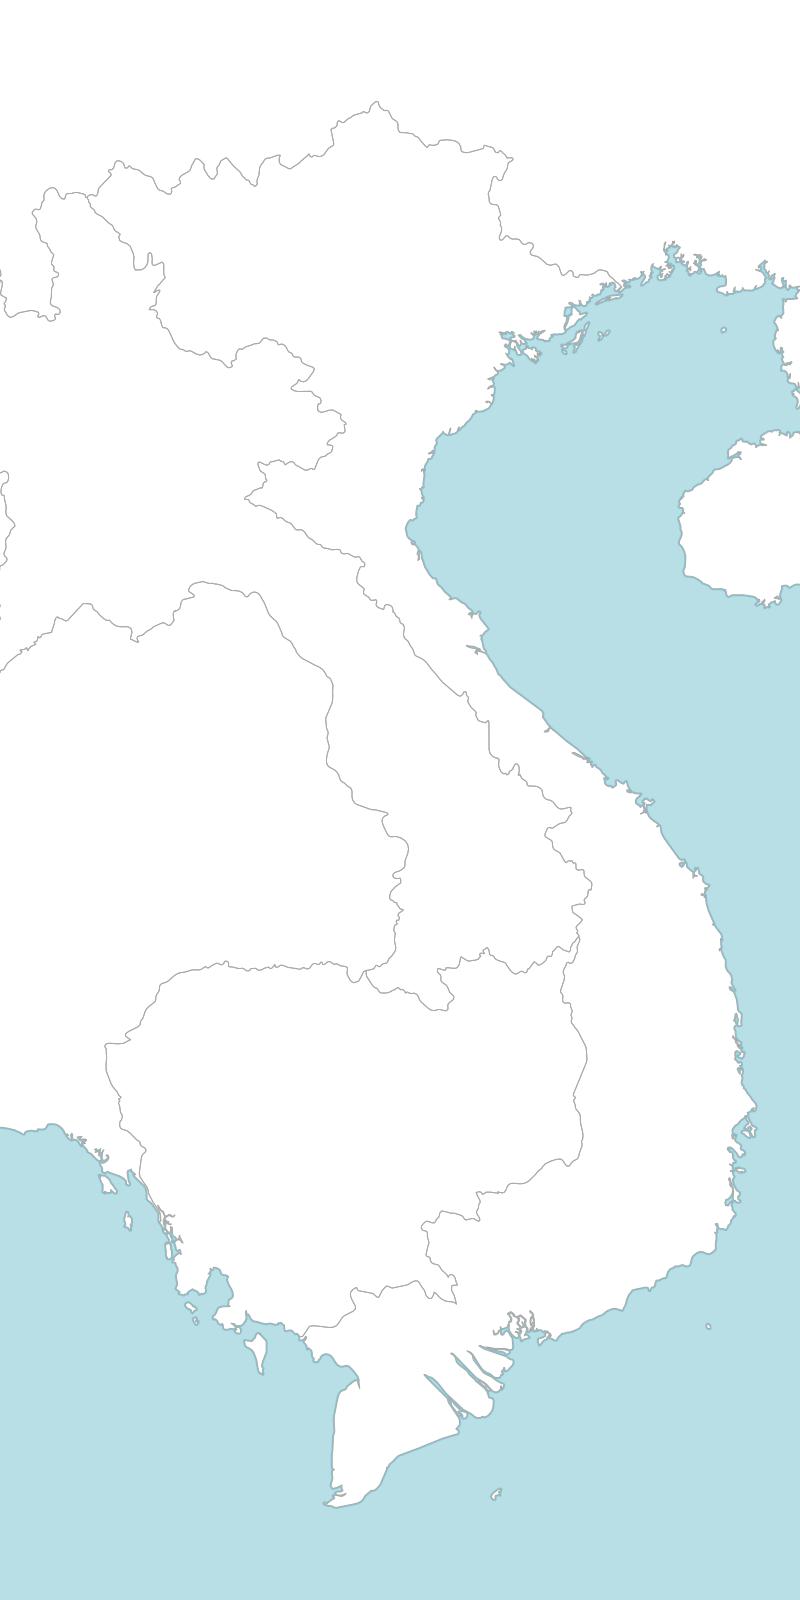 6 free maps of Vietnam - ASEAN UP